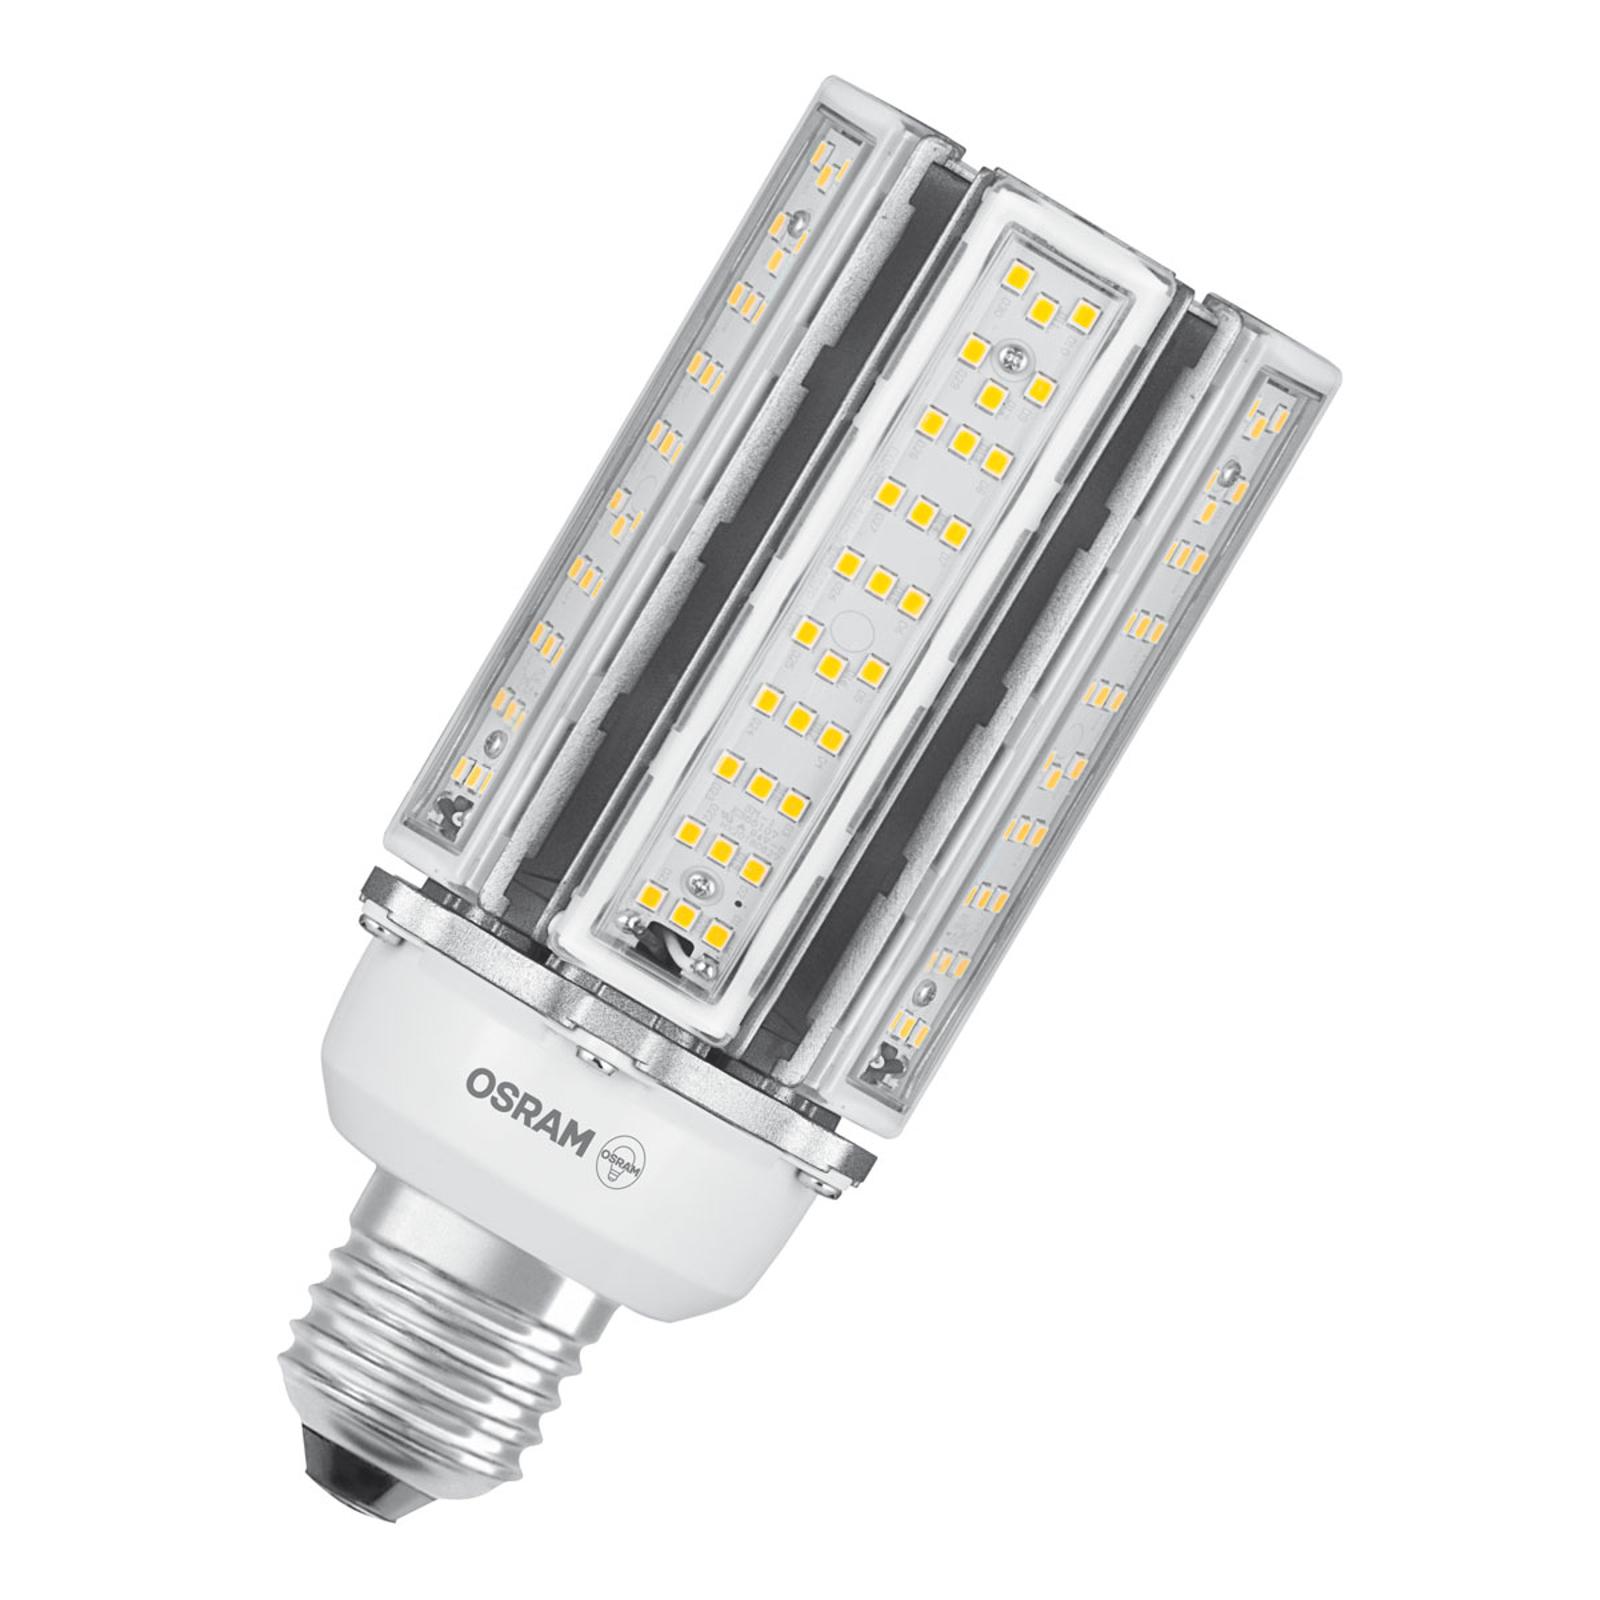 OSRAM-LED-lamppu E40 Parathom HQL 46W 2 700 K